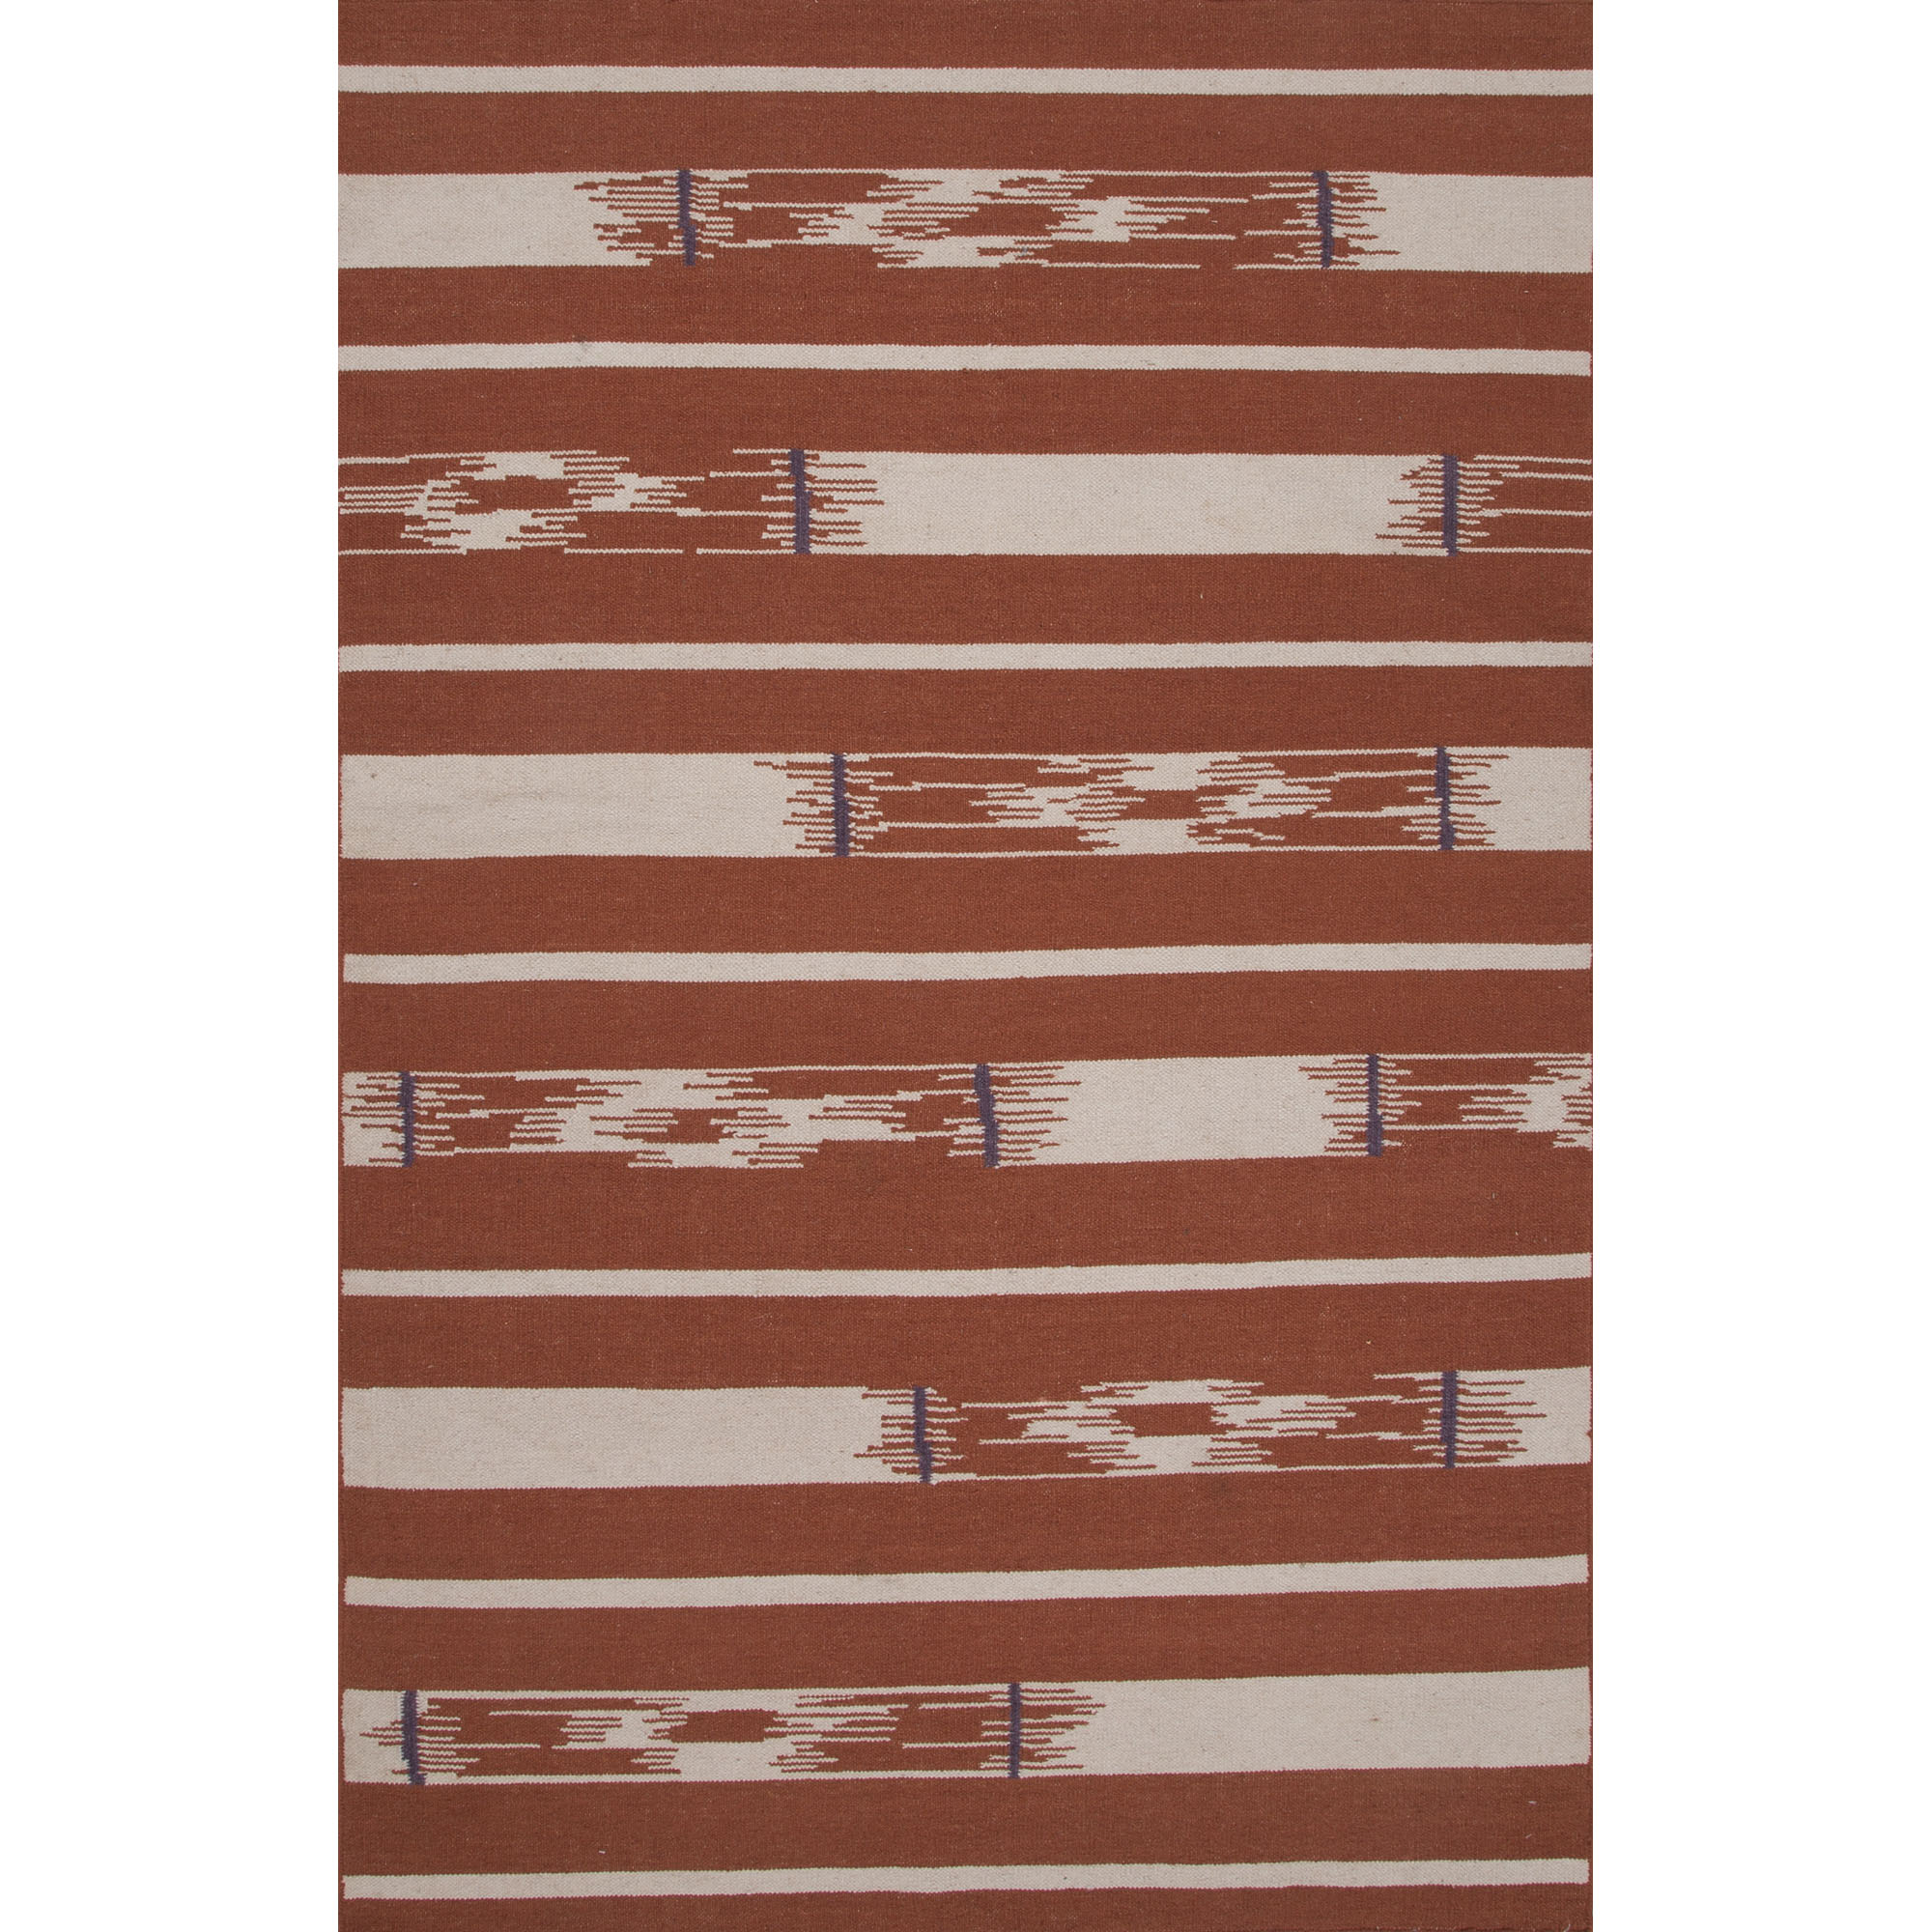 JAIPUR Rugs Traditions Modern Flat Weave 8 x 11 Rug - Item Number: RUG122243